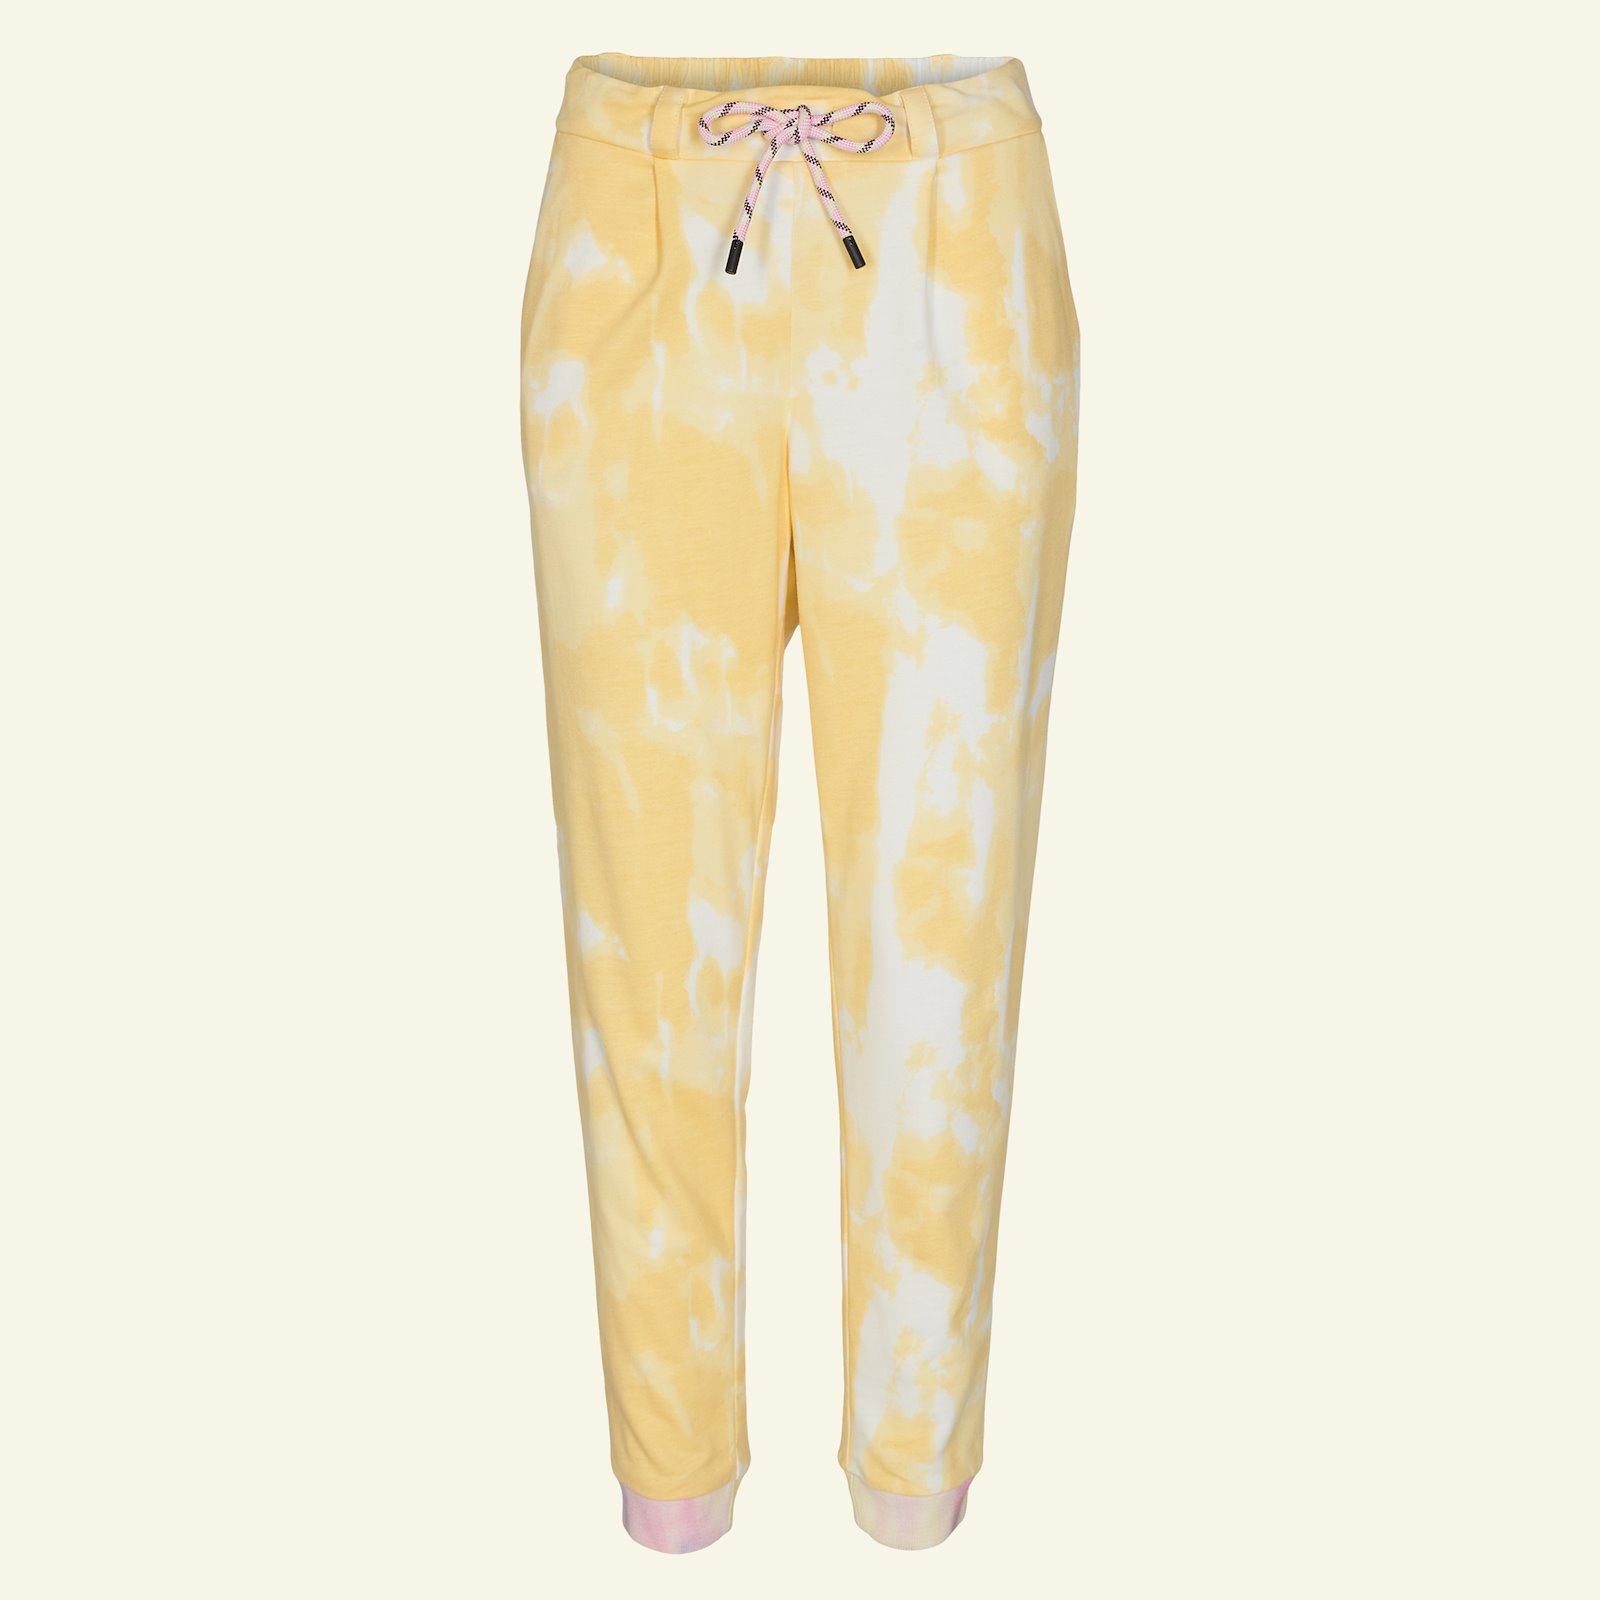 Trousers, 46/18 p20050_211782_75091_sskit